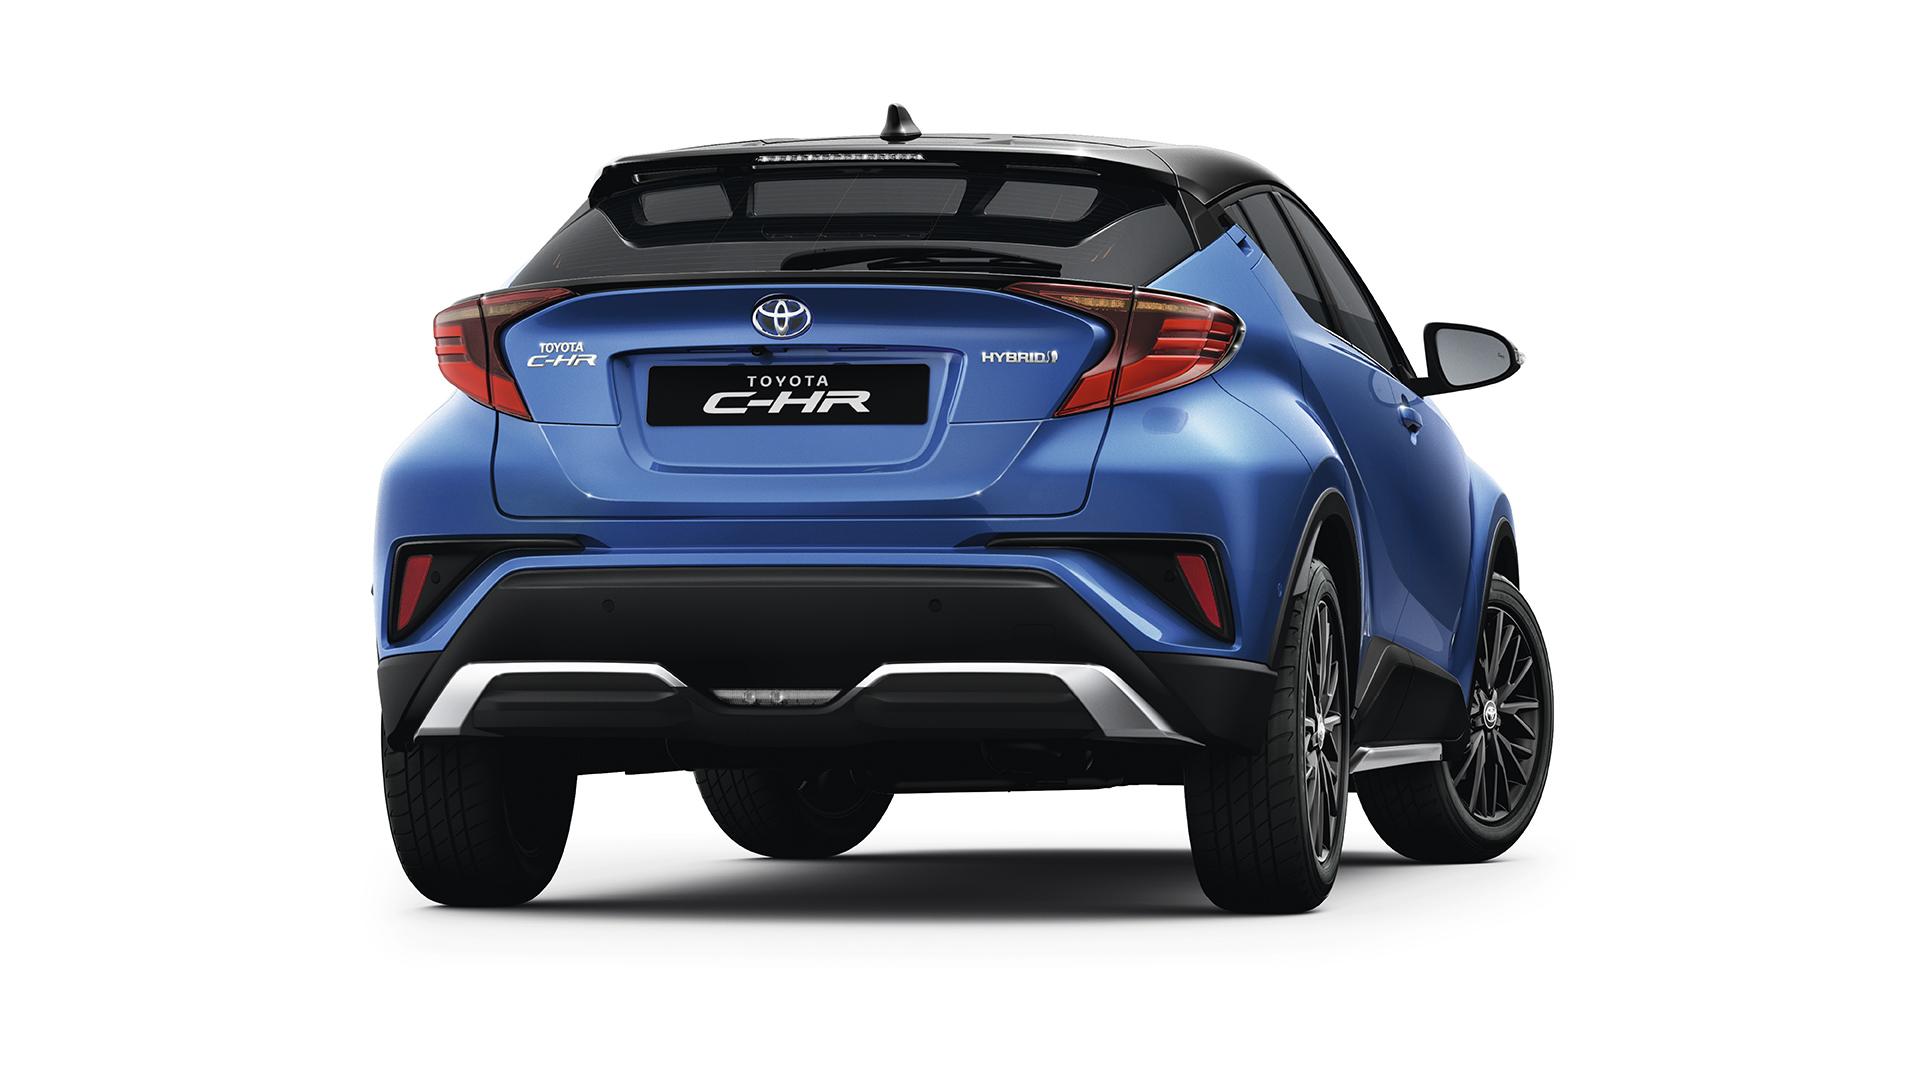 Toyota-c-hr-2019-gallery-011-full tcm-22-1776354